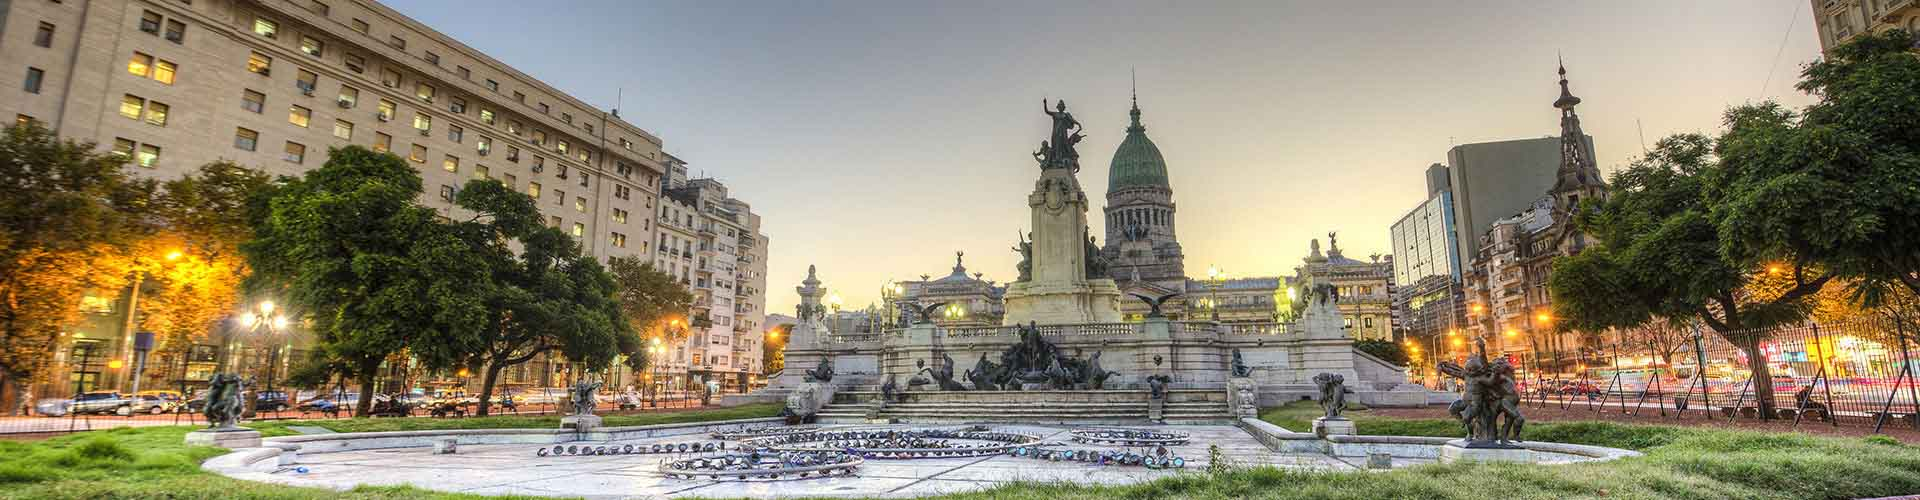 Buenos Aires - Hostelů v Buenos Aires. Mapy pro Buenos Aires, fotky a recenze pro každý hostel v Buenos Aires.